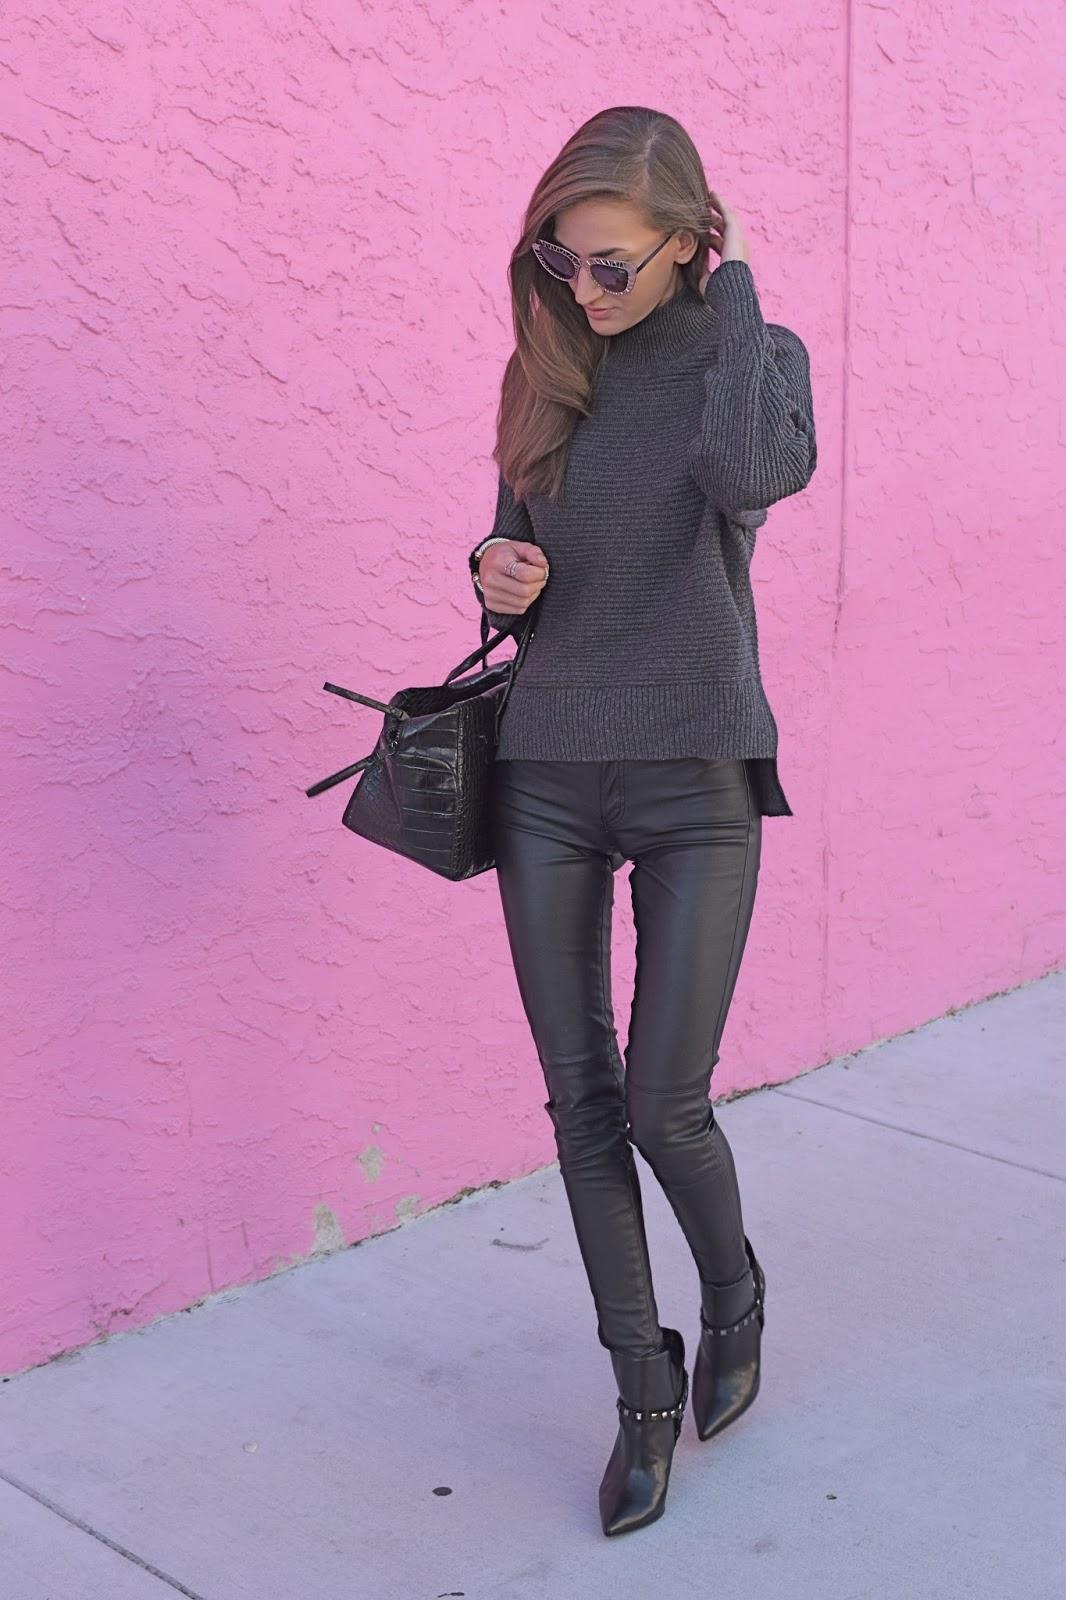 Loft Grey Knit oversized sweater, Case App Custom made phone case, Blank Denim Vegan Leather pants